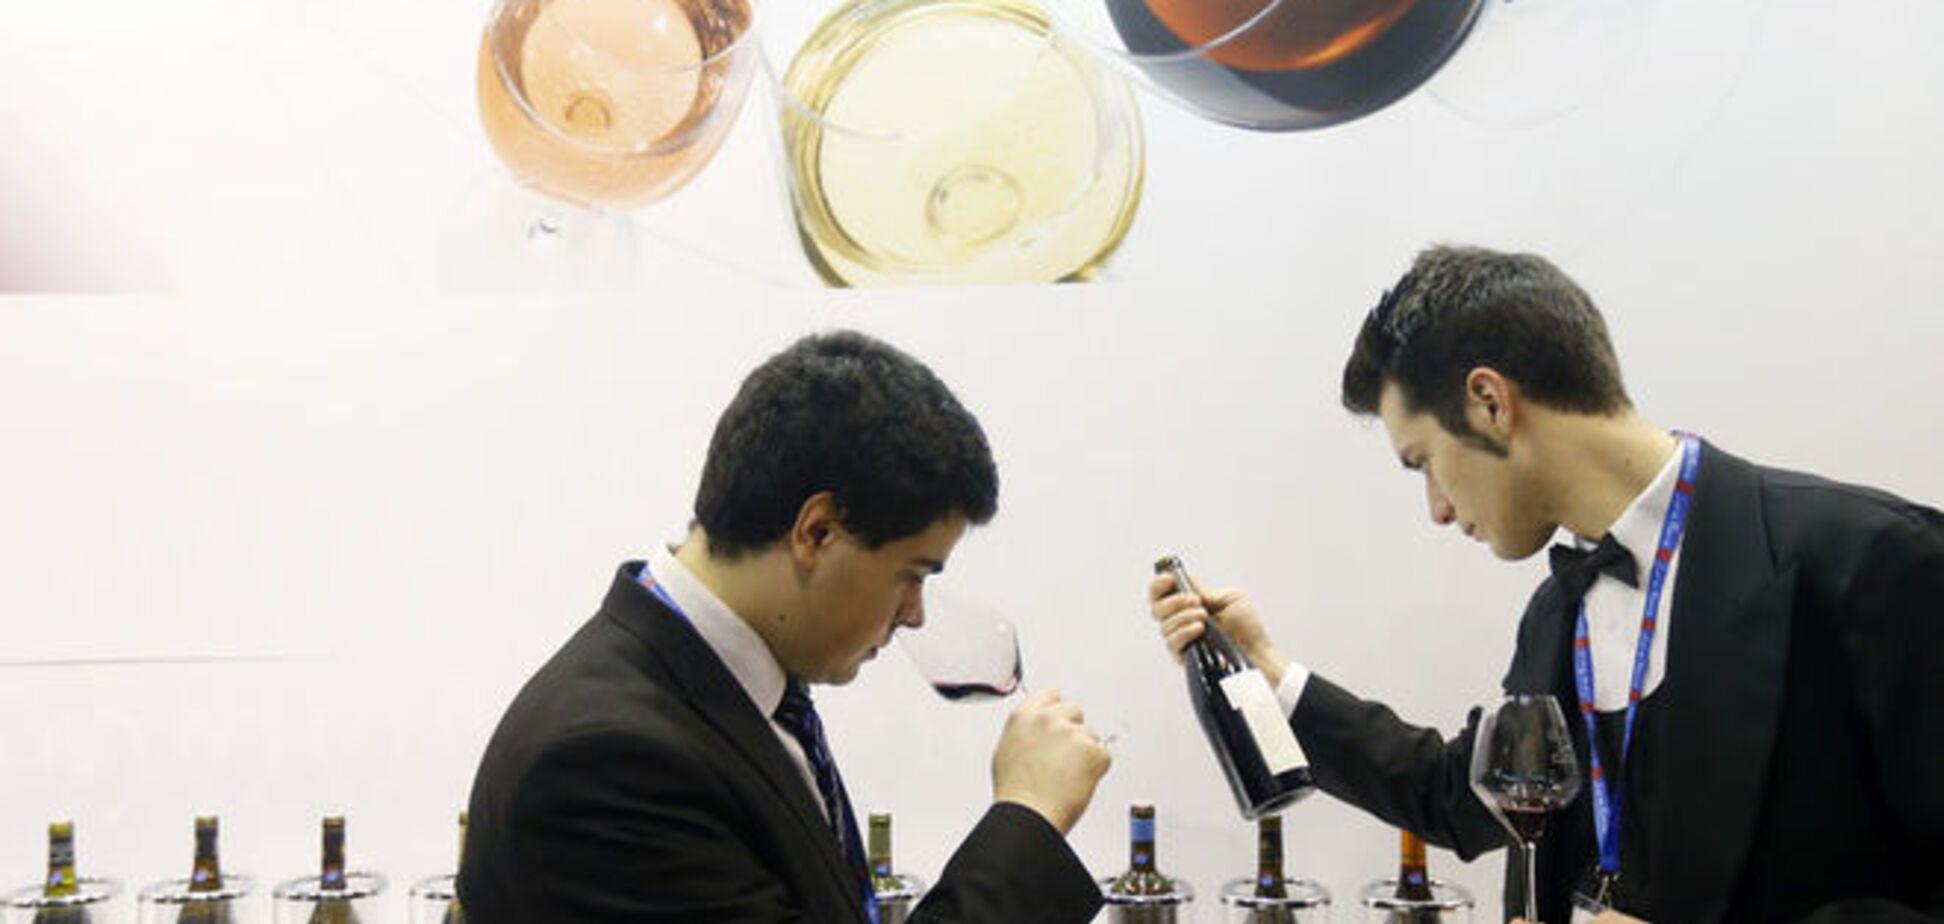 Напиток для дураков: Vox высмеял ценителей дорогого вина